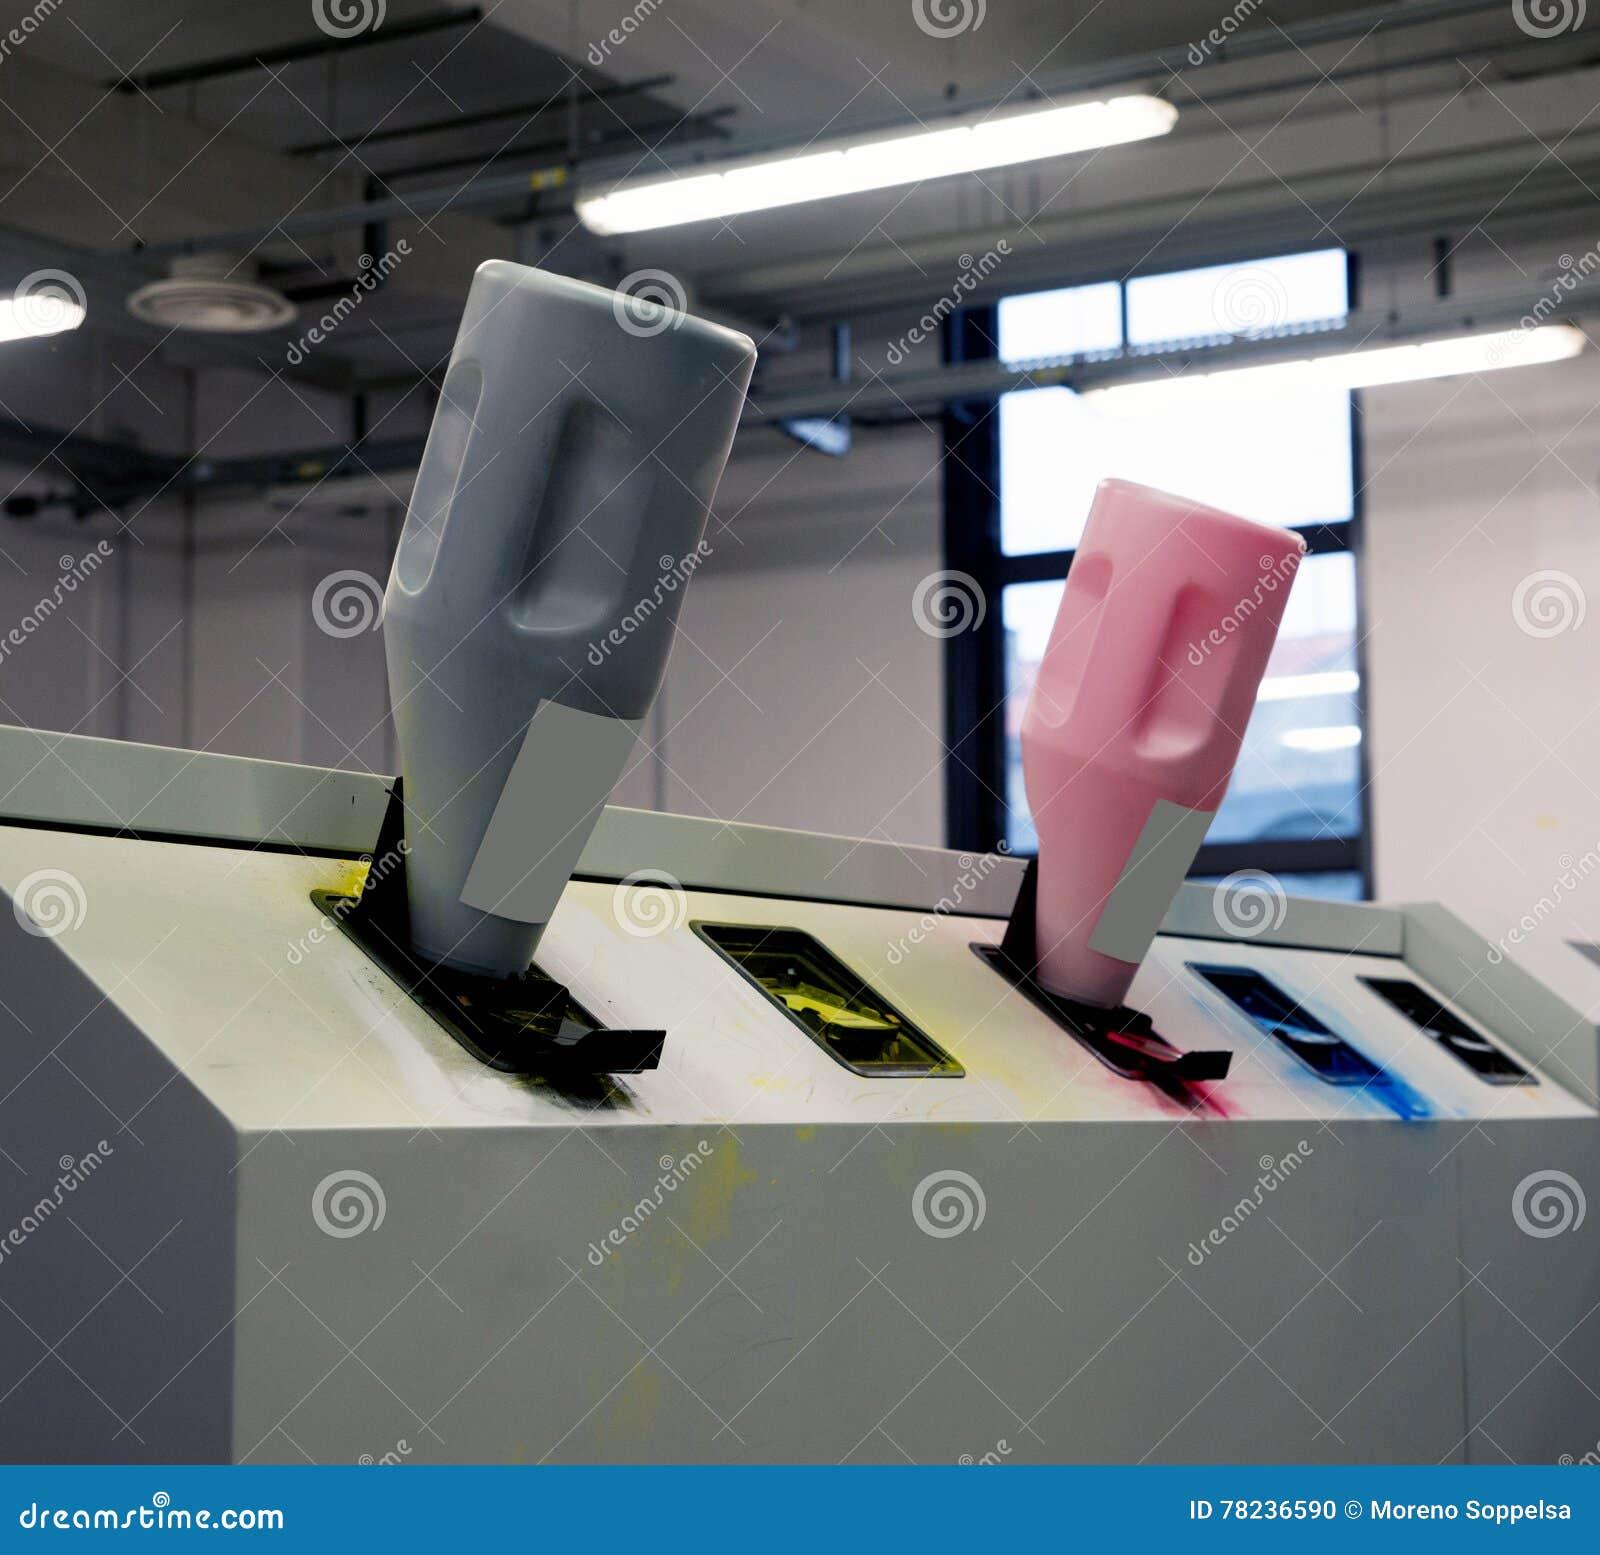 Print Shop - Digital press printing machine